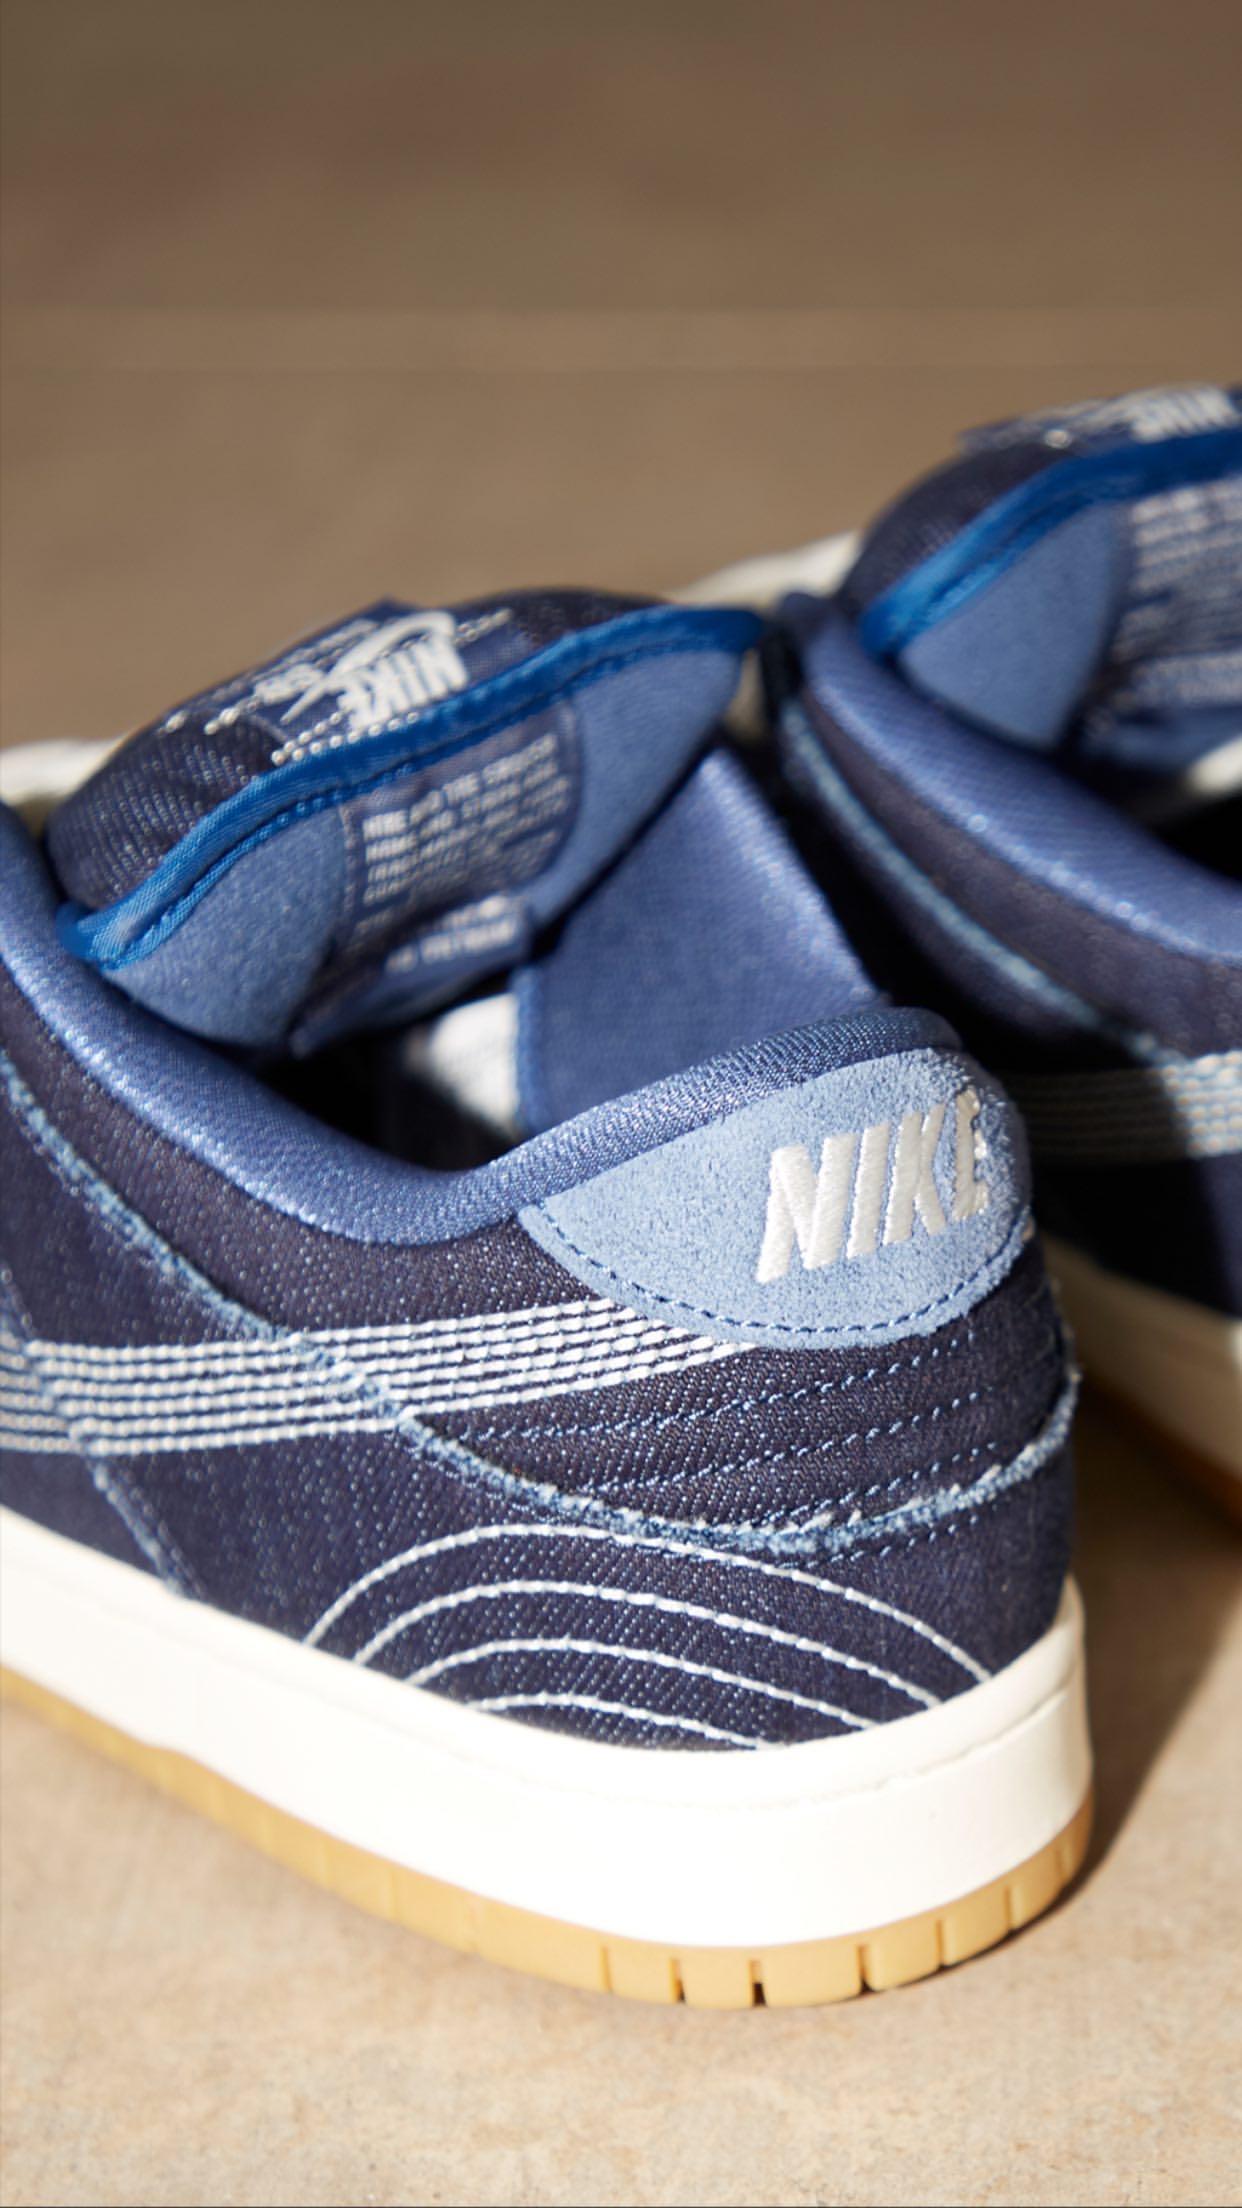 8月1日 発売予定 NIKE SB DUNK LOW PRO PRM (CV0316-400)